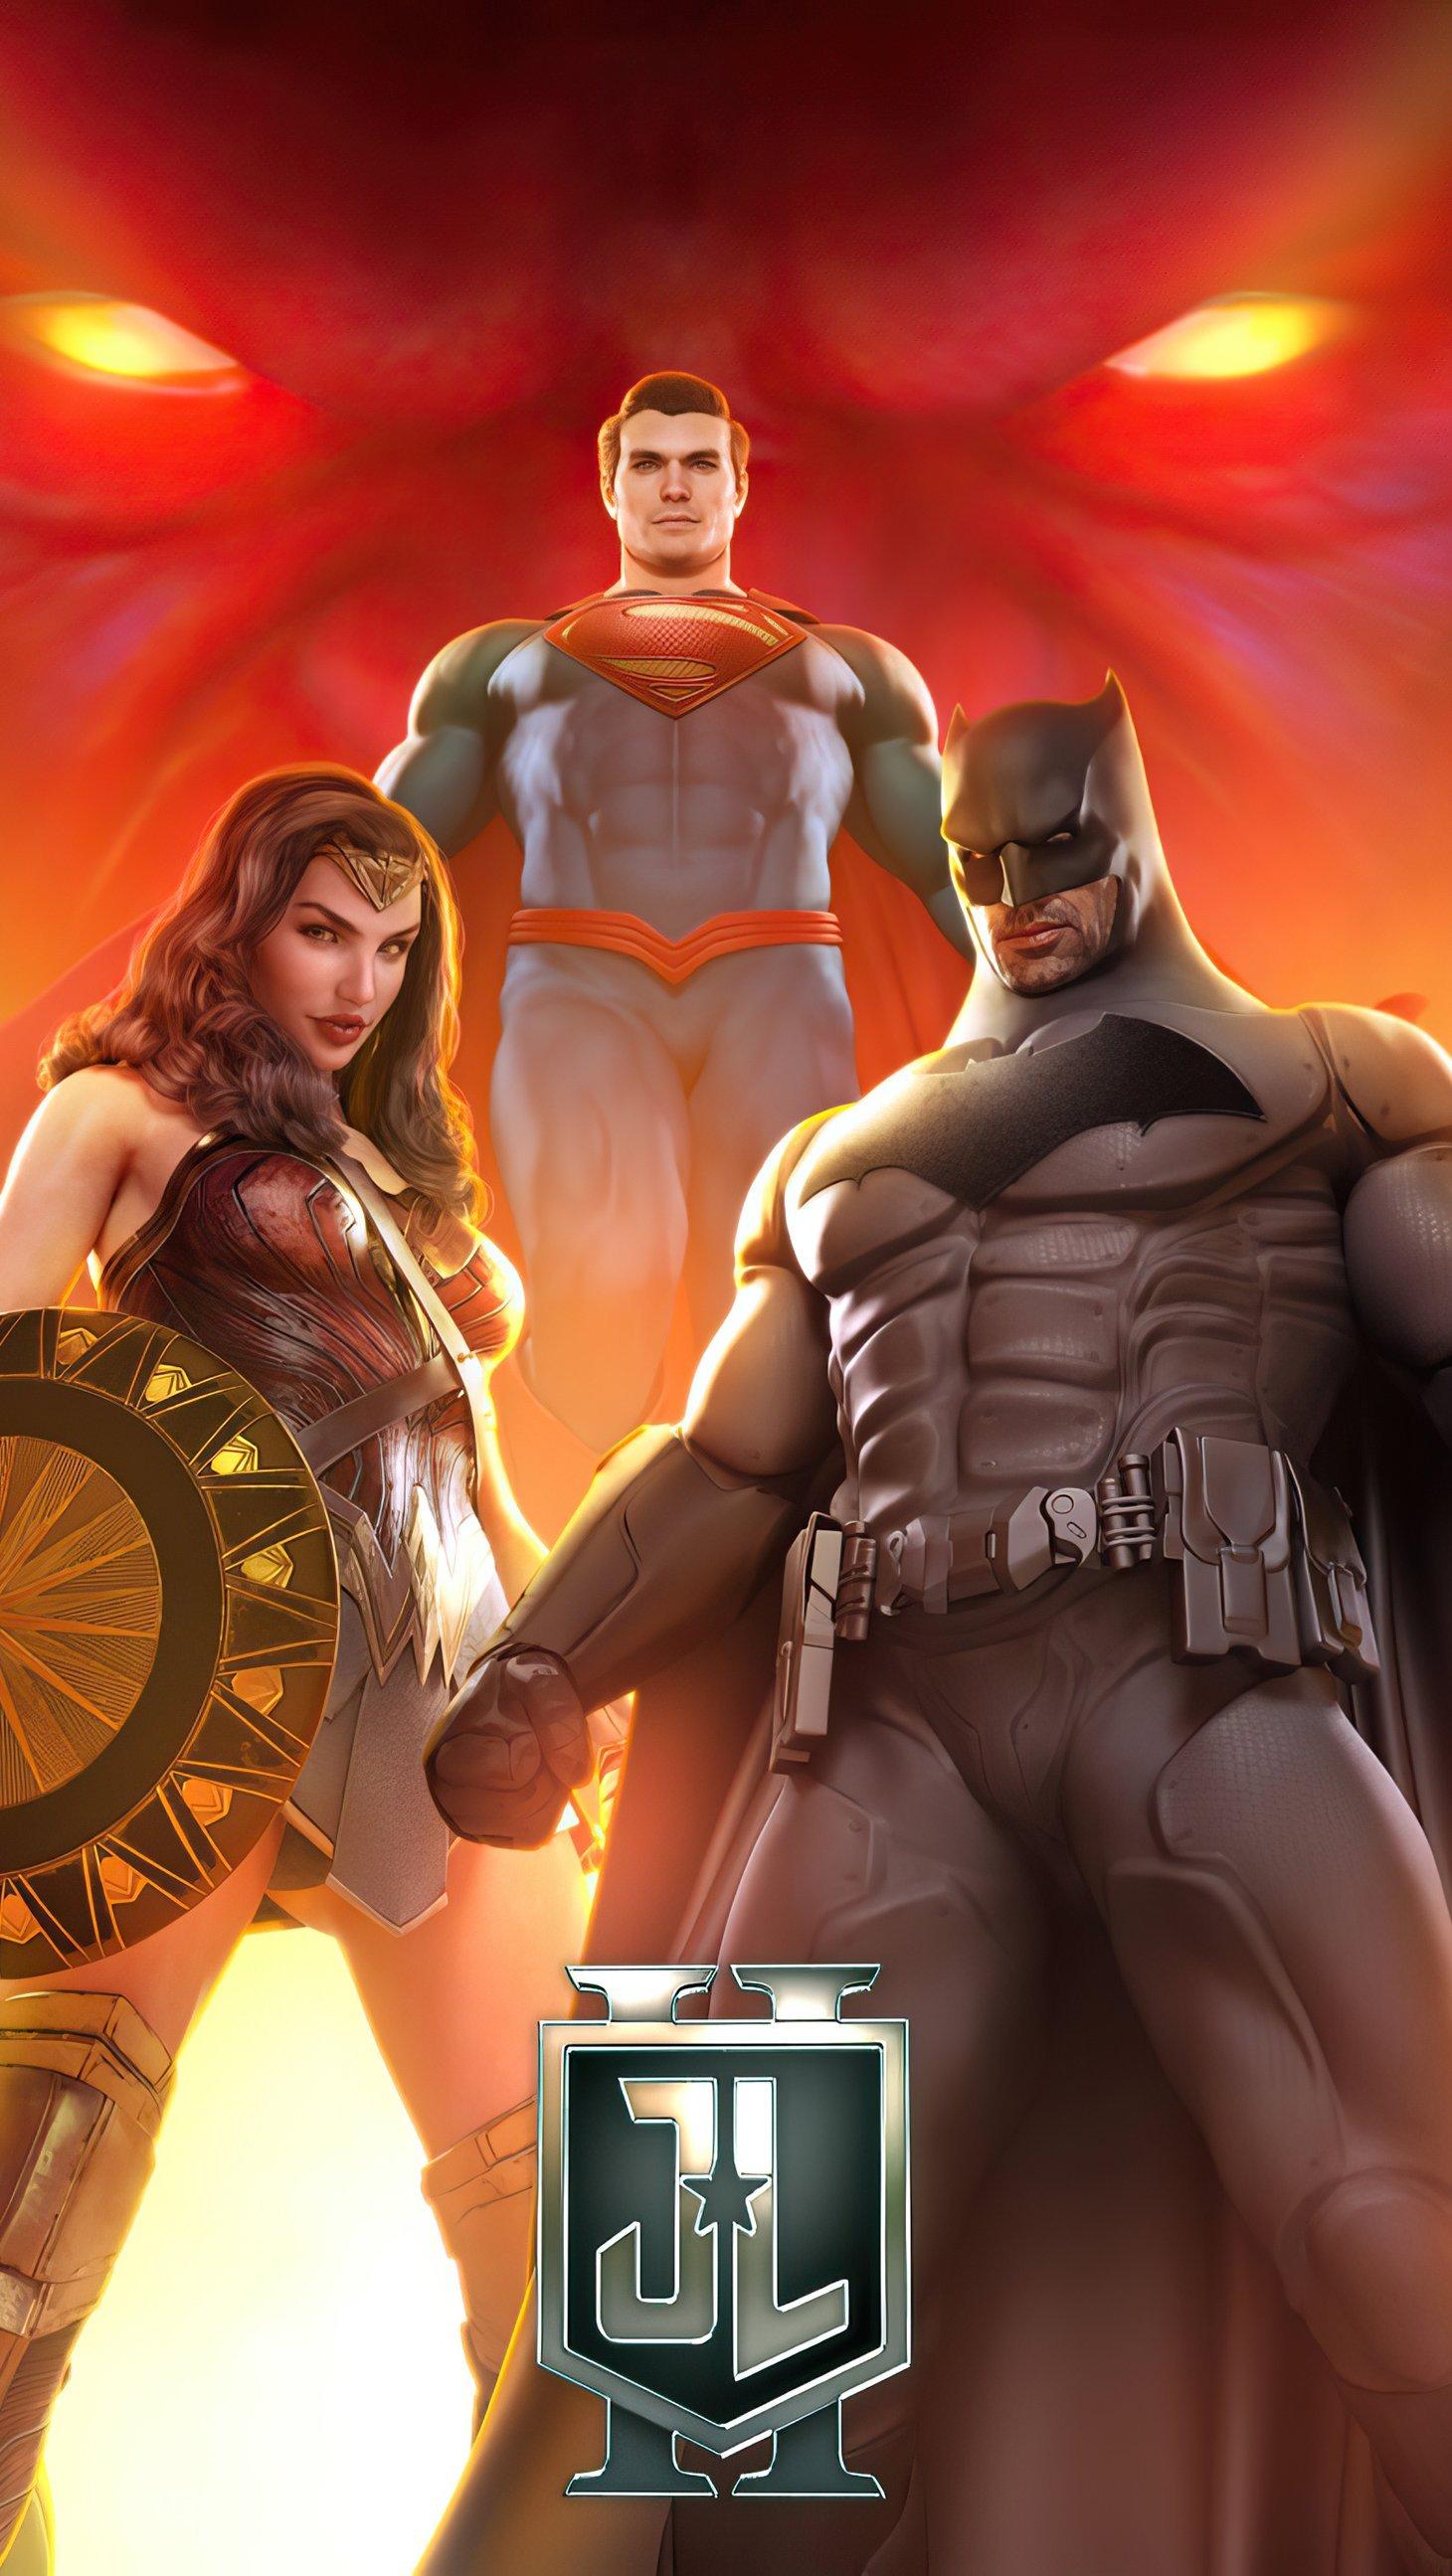 Wallpaper Justice League Superheroes Vertical